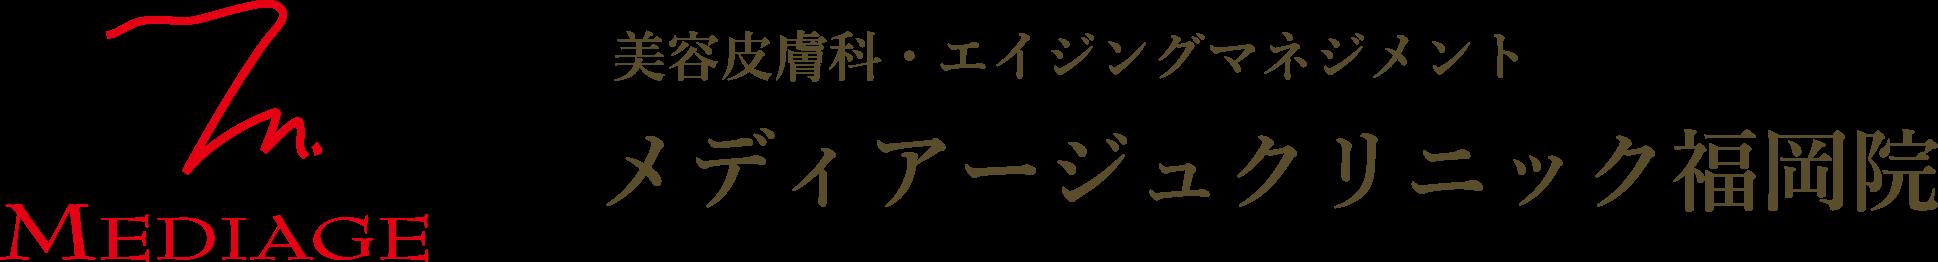 MEDIAGE 美容皮膚科・エイジングマネジメント メディアージュクリニック福岡院